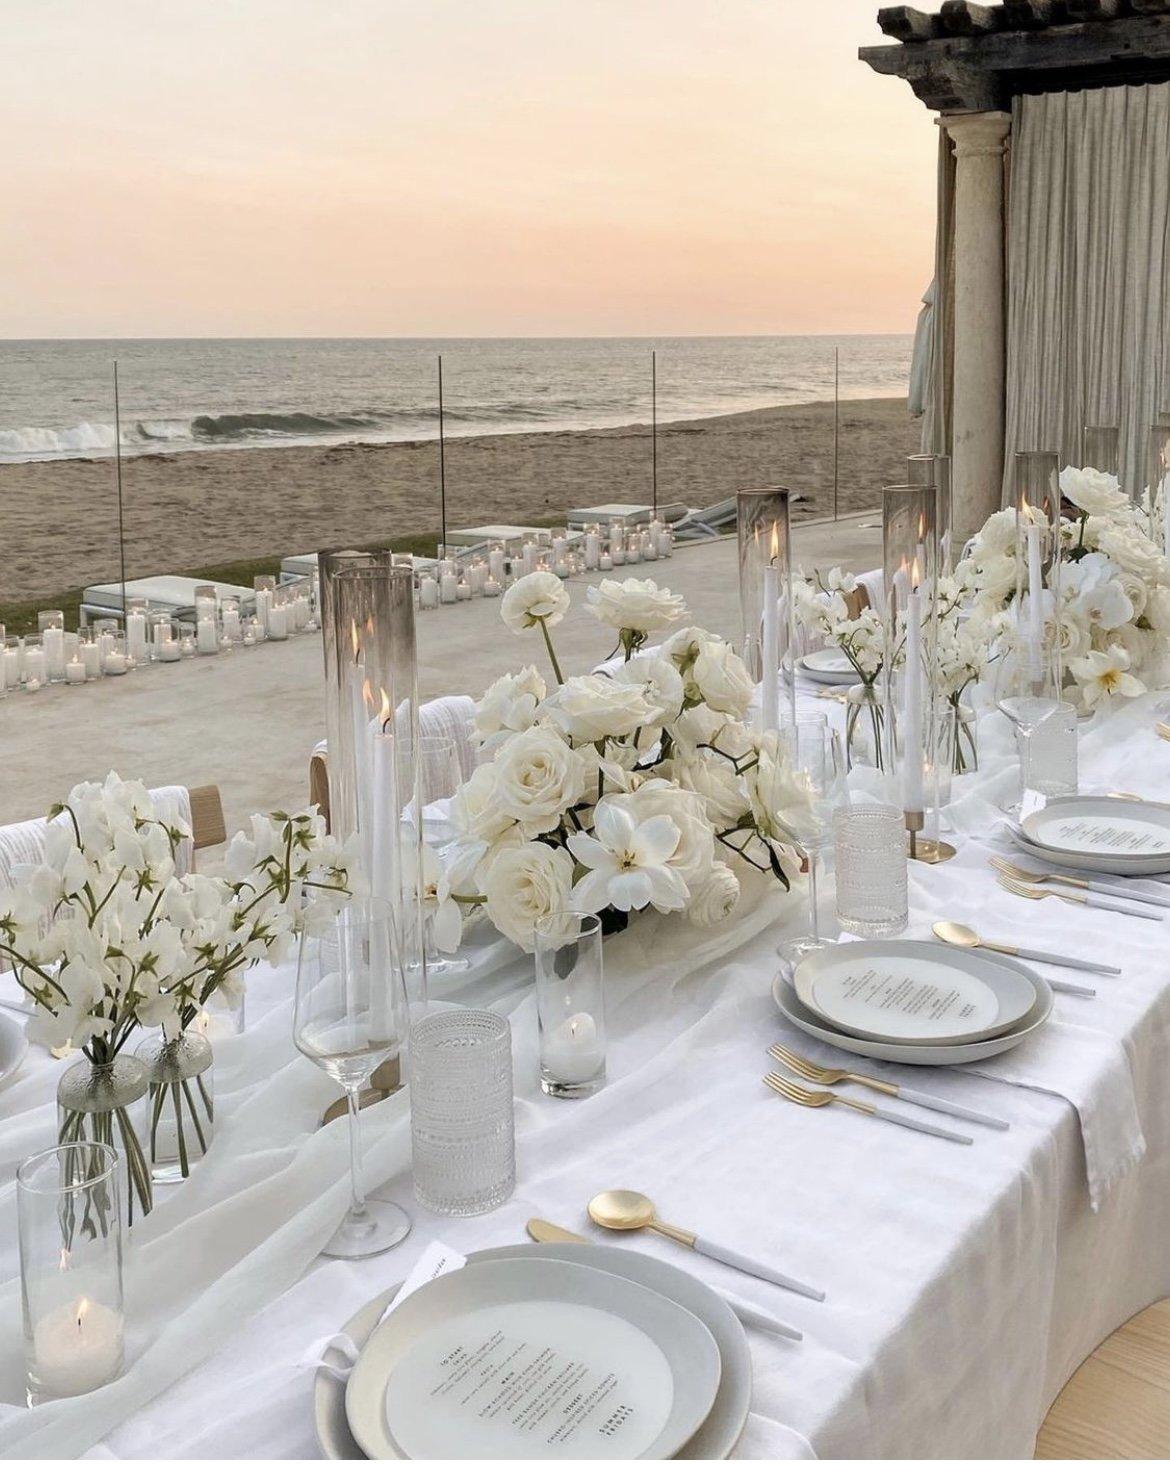 ocean view tablescape